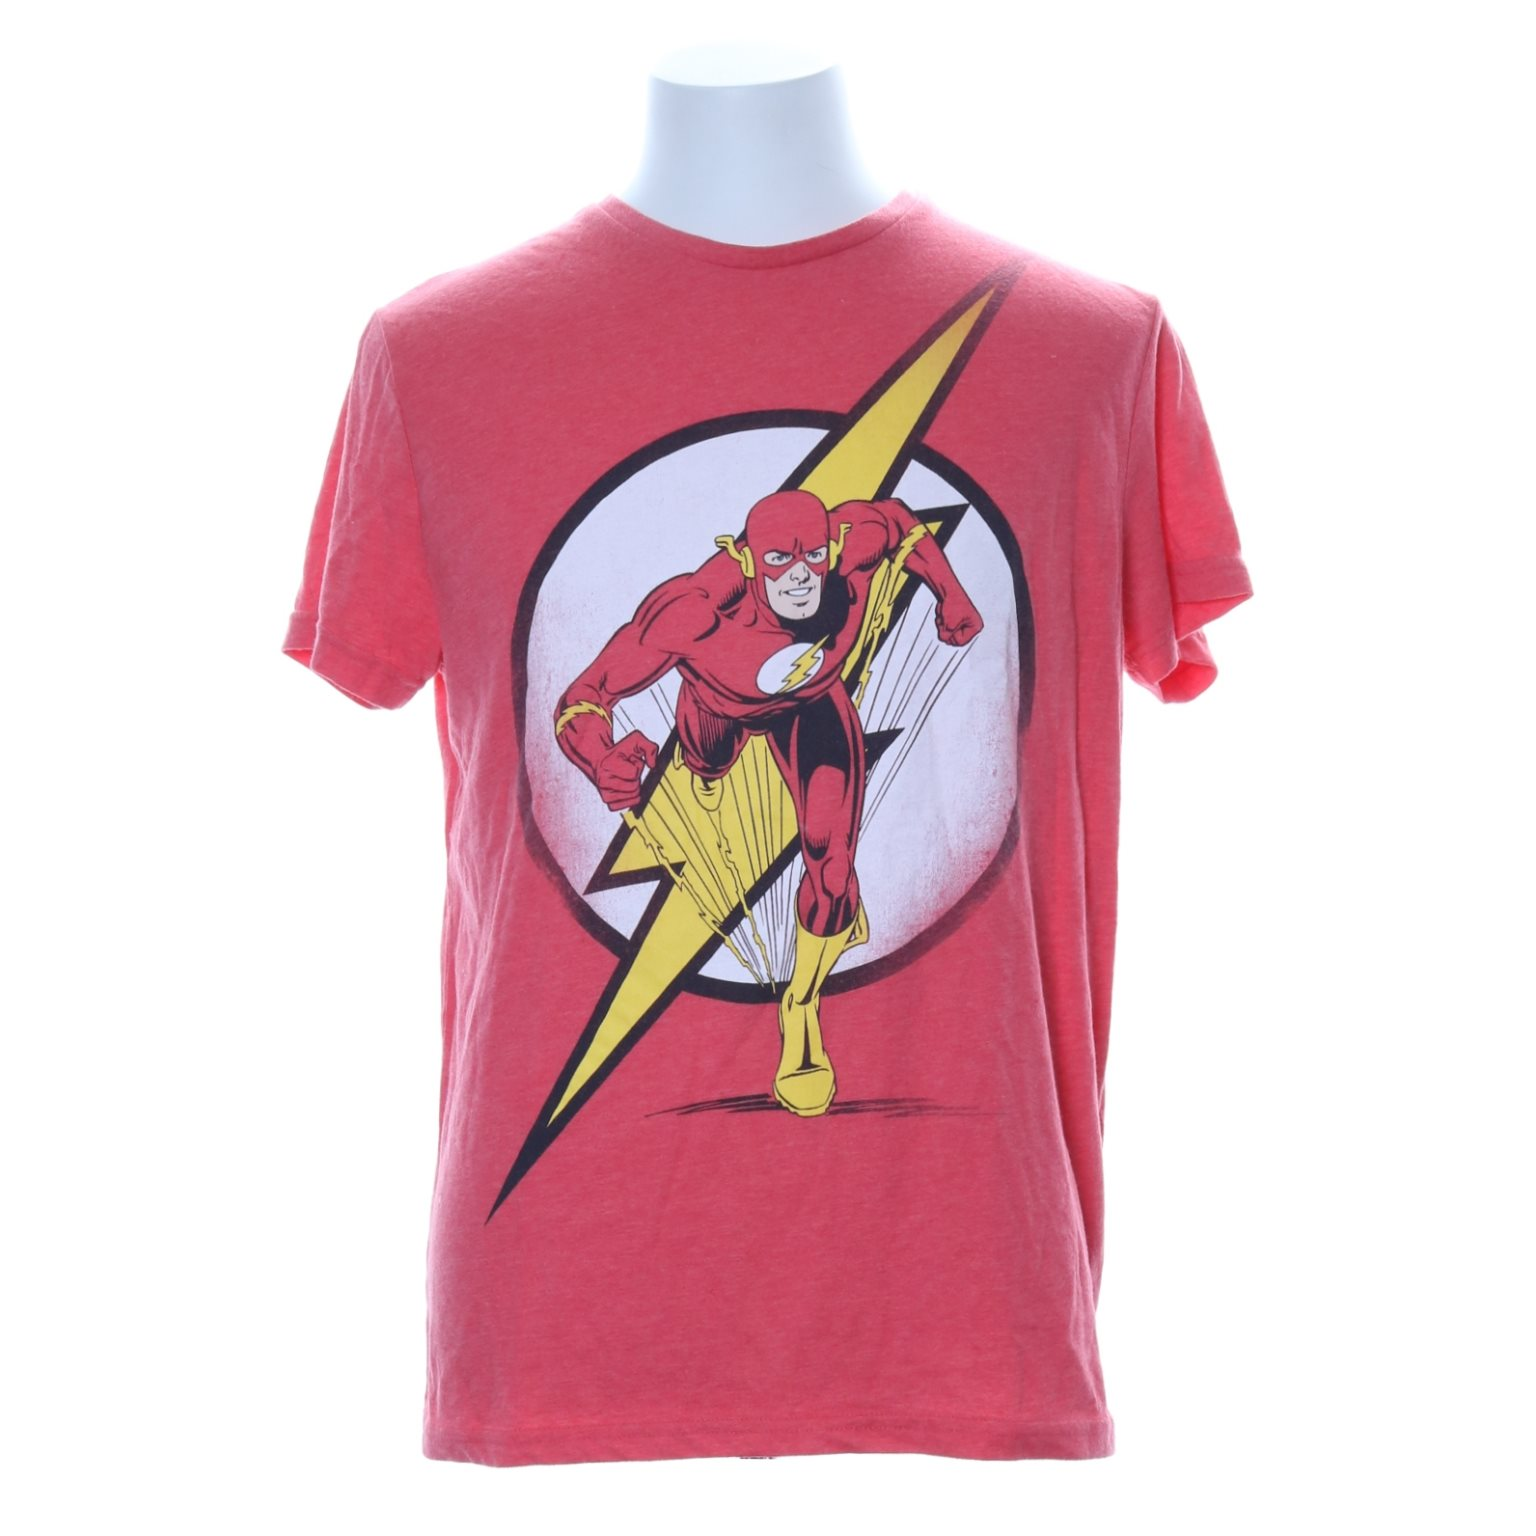 DC Comics, T-shirt, Strl: L, Rosa/Flerfärgad